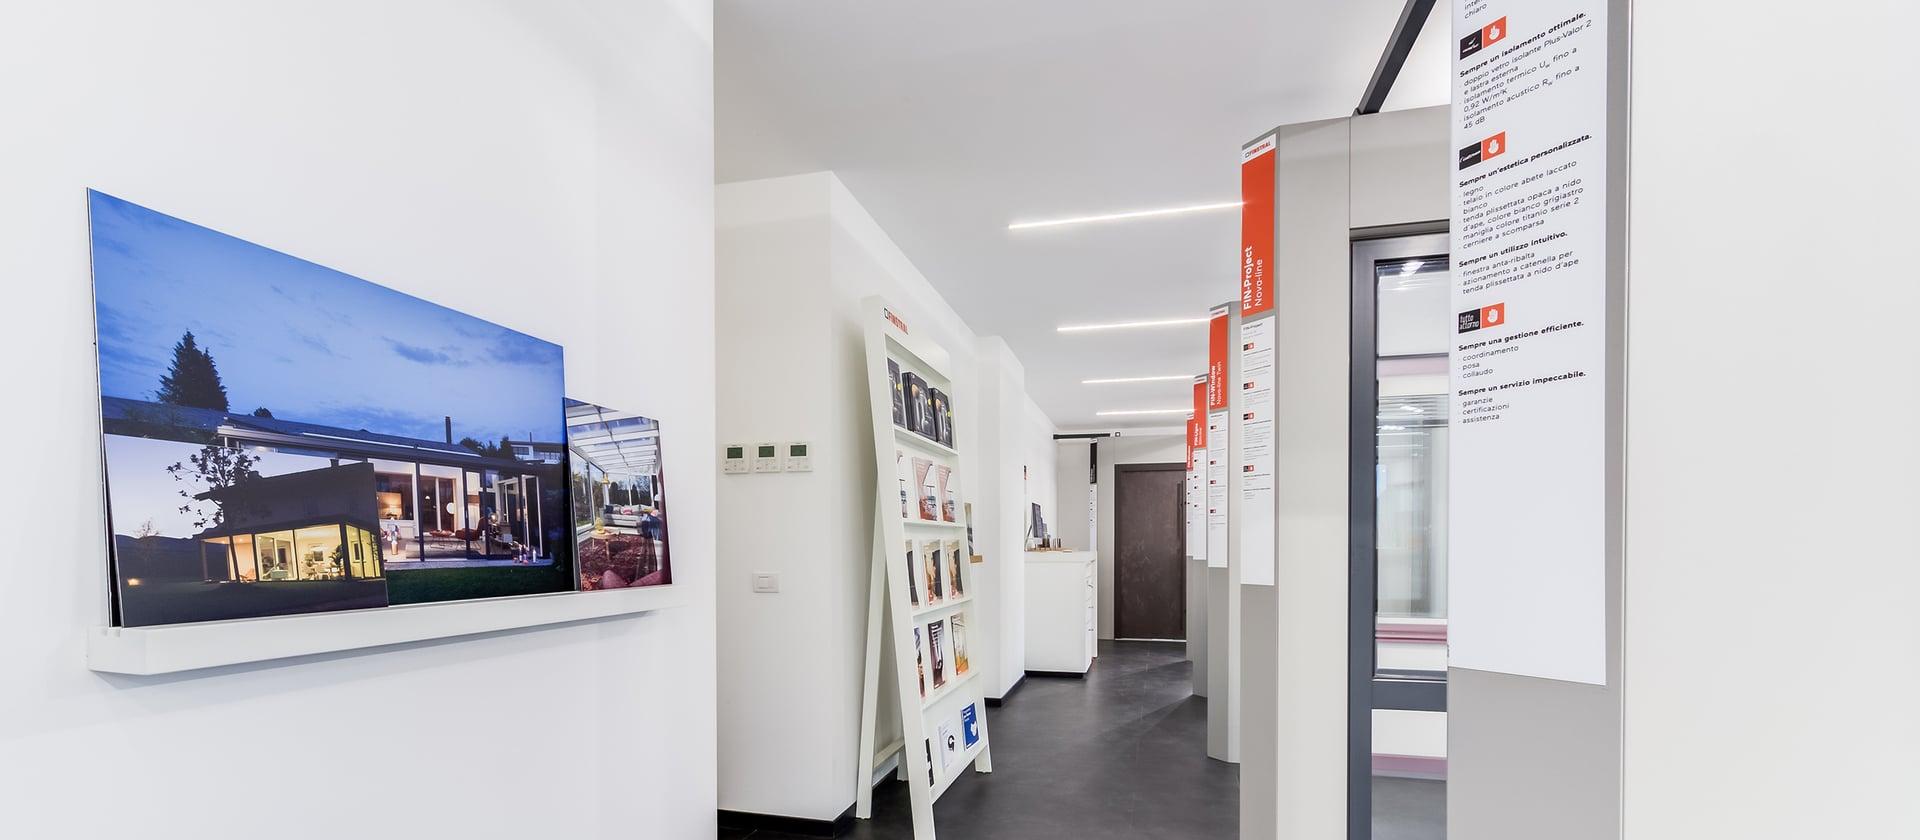 Studio Finstral Roma